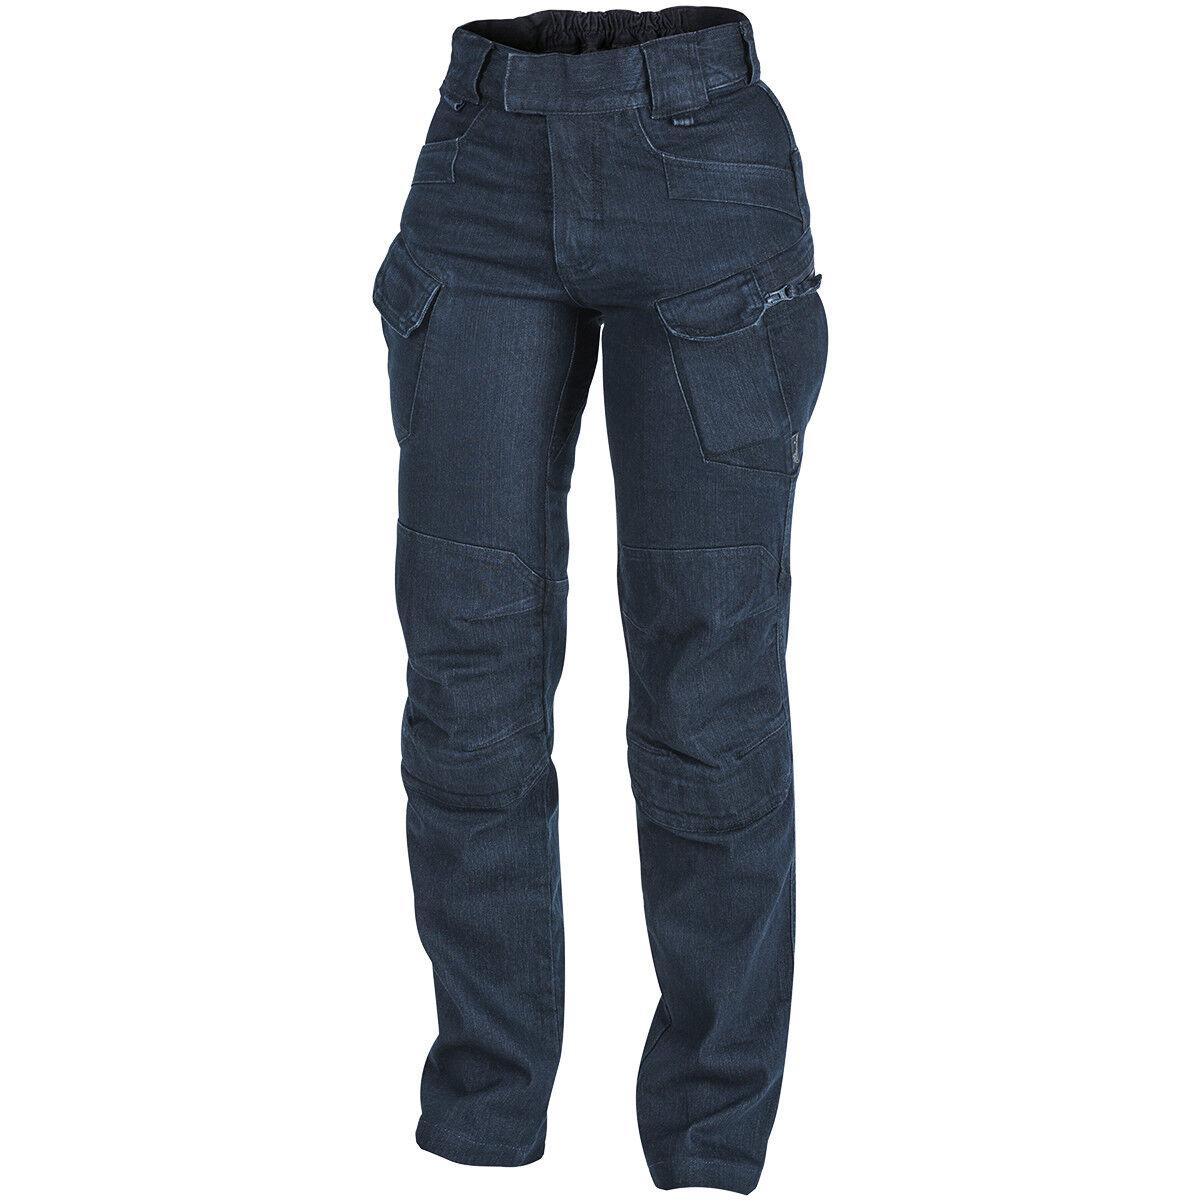 Helikon pantaloni UTP femminile Tactical Hire Combat Security Trousers Denim blu